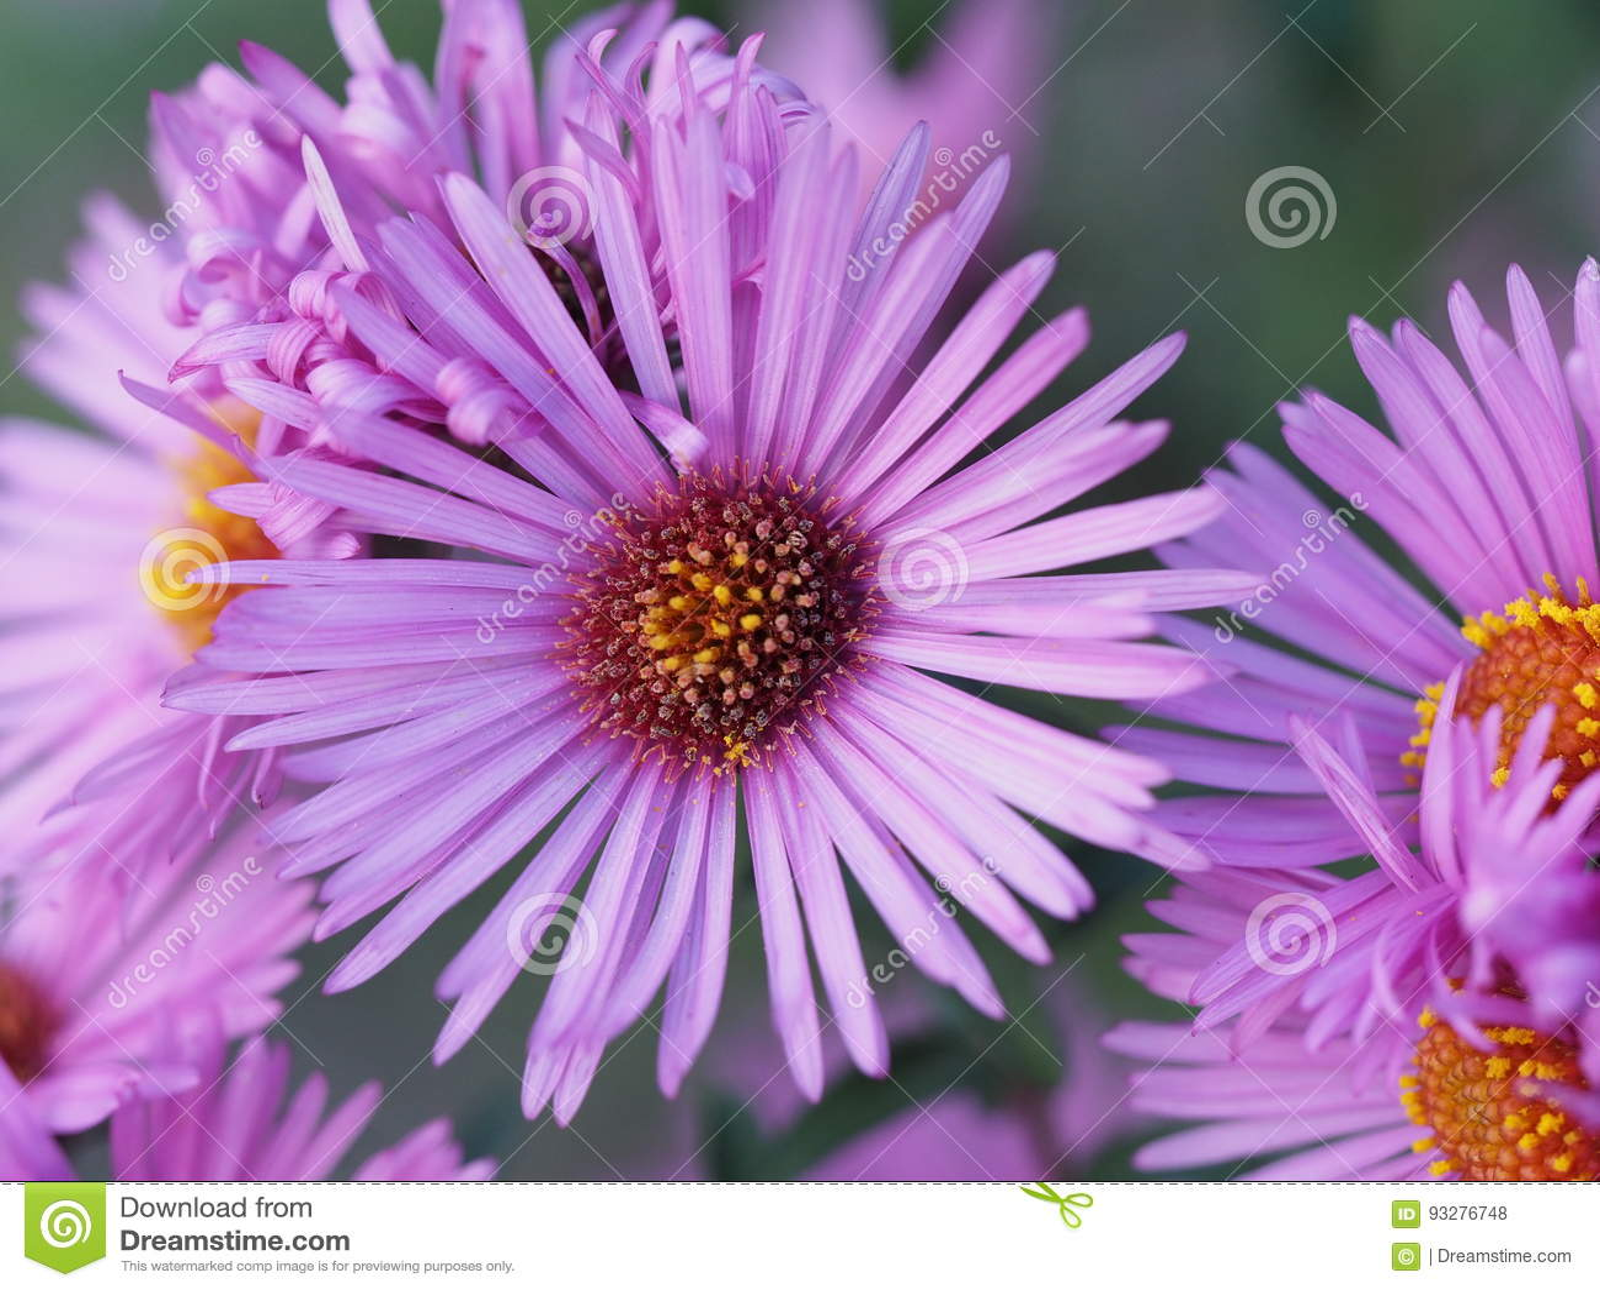 Blogging day - flower lilac sunny flower in the garden